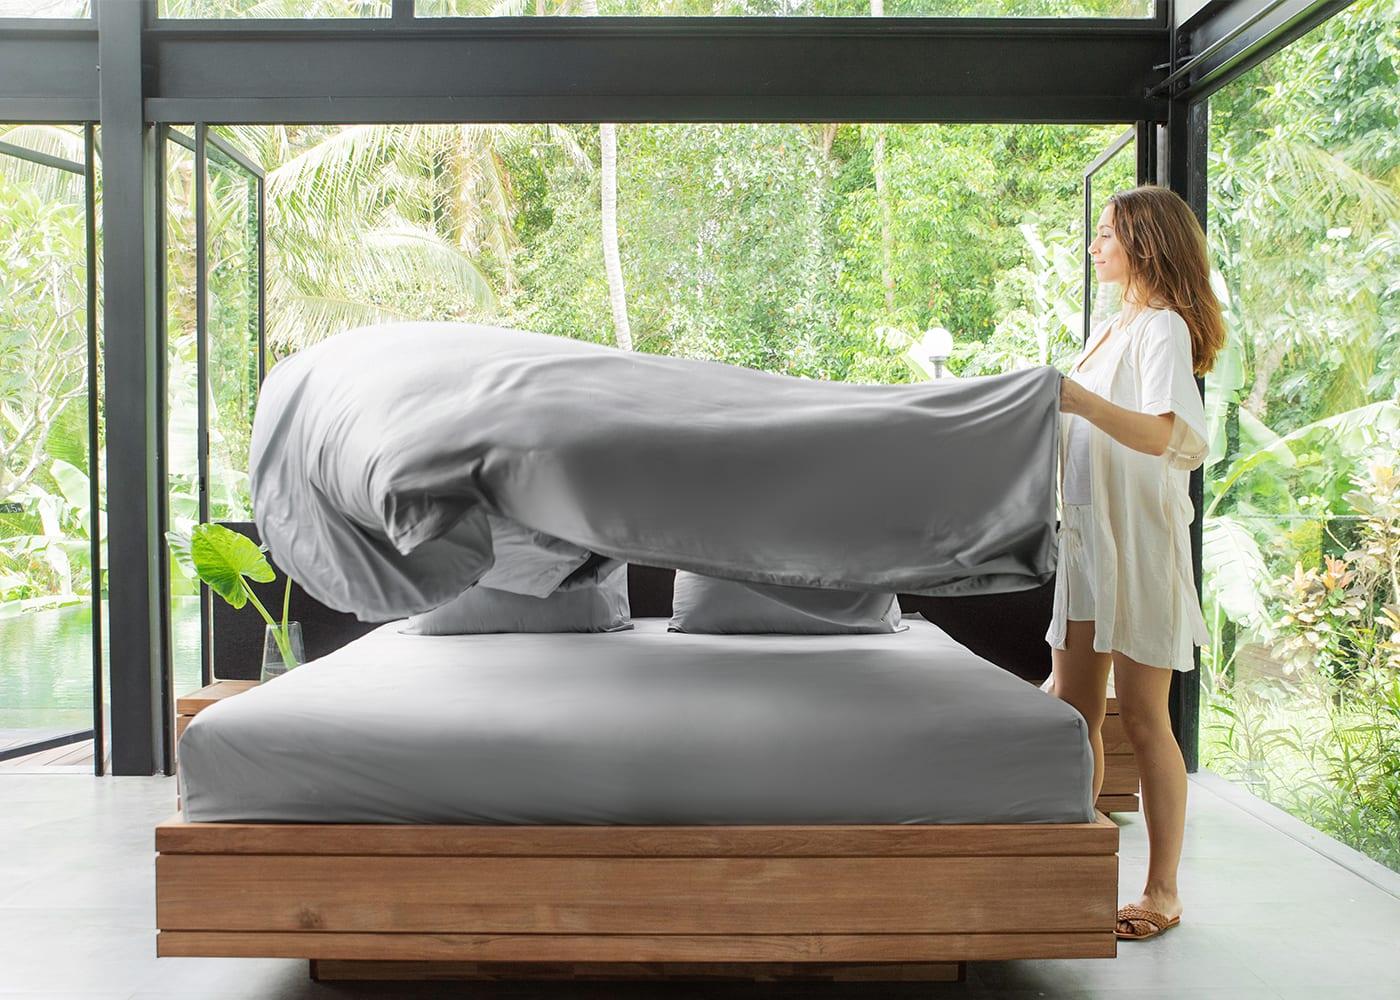 Boost your immunity with good sleep